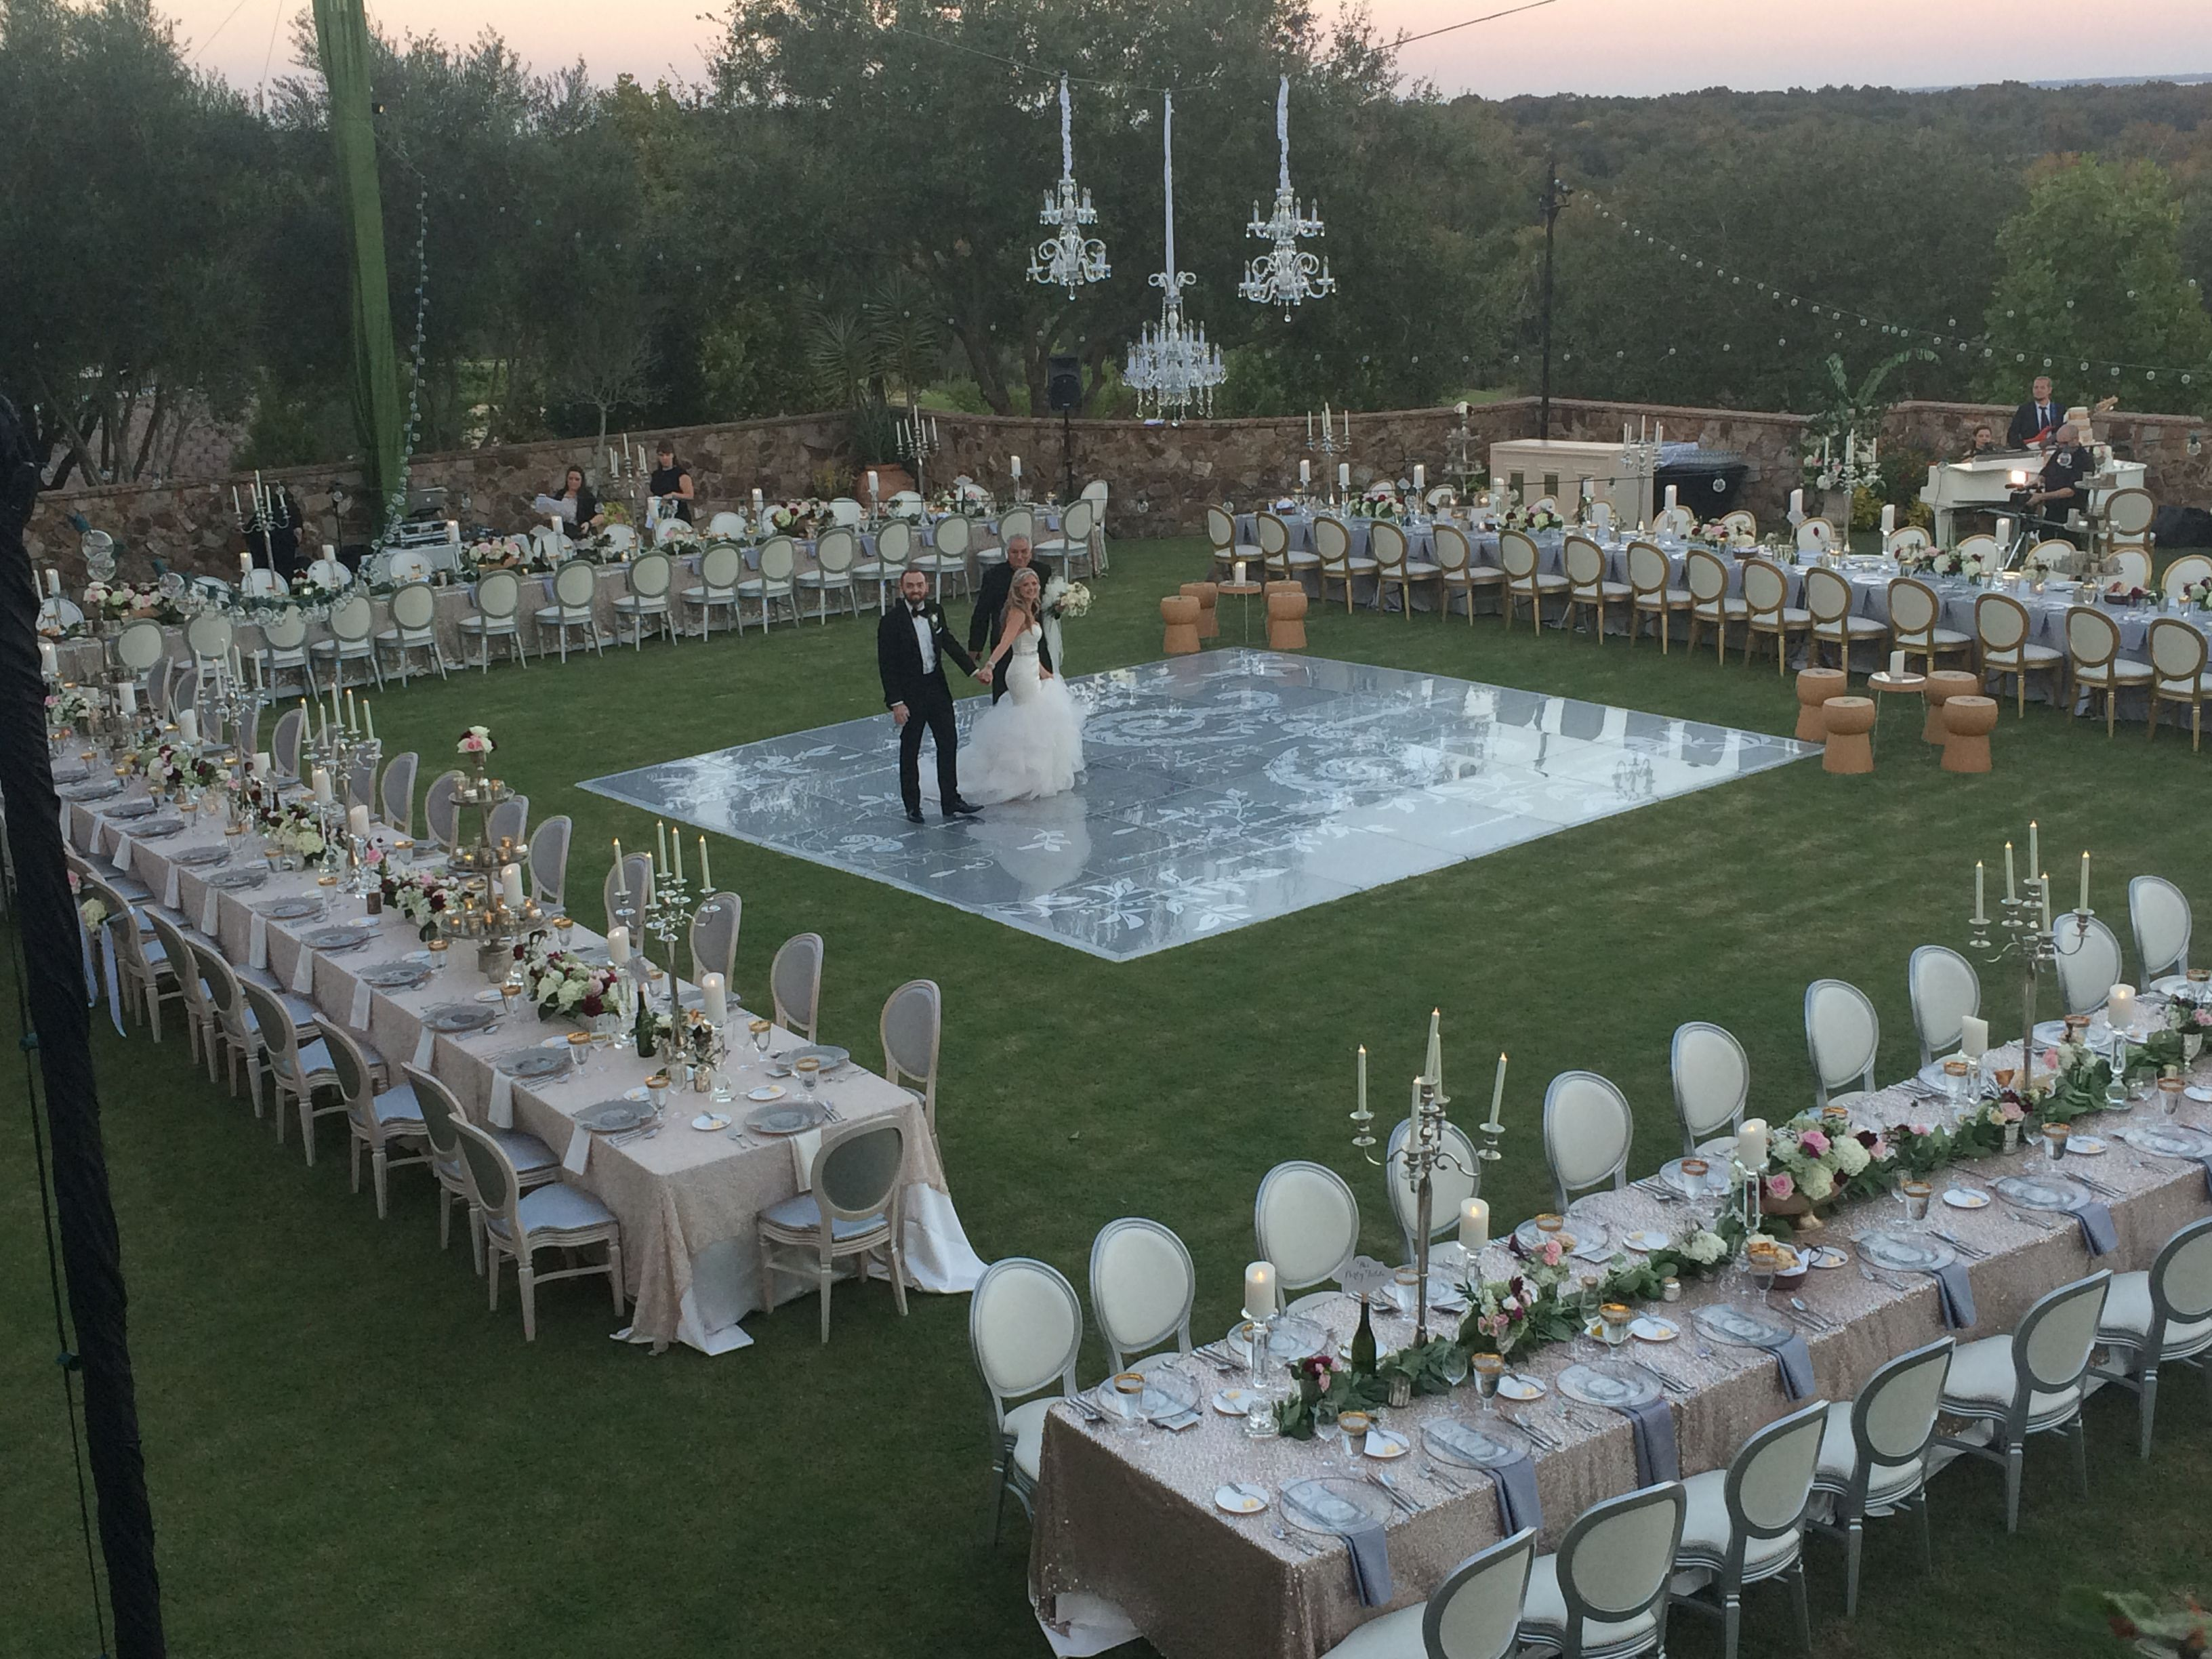 Our Outdoor Wedding Reception